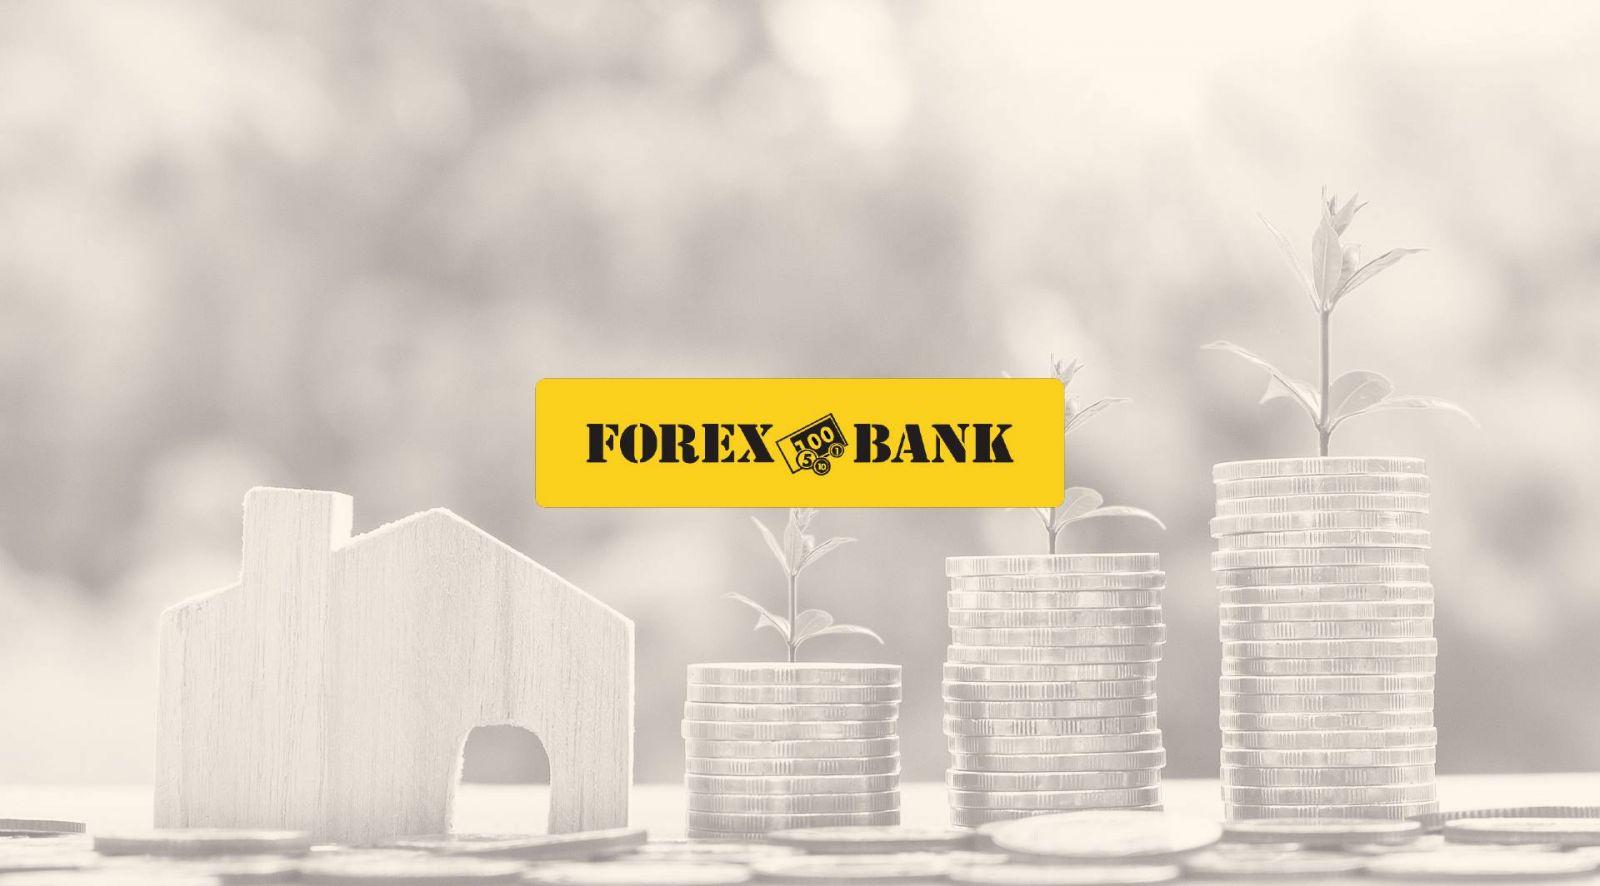 Forex Bank Mobilia